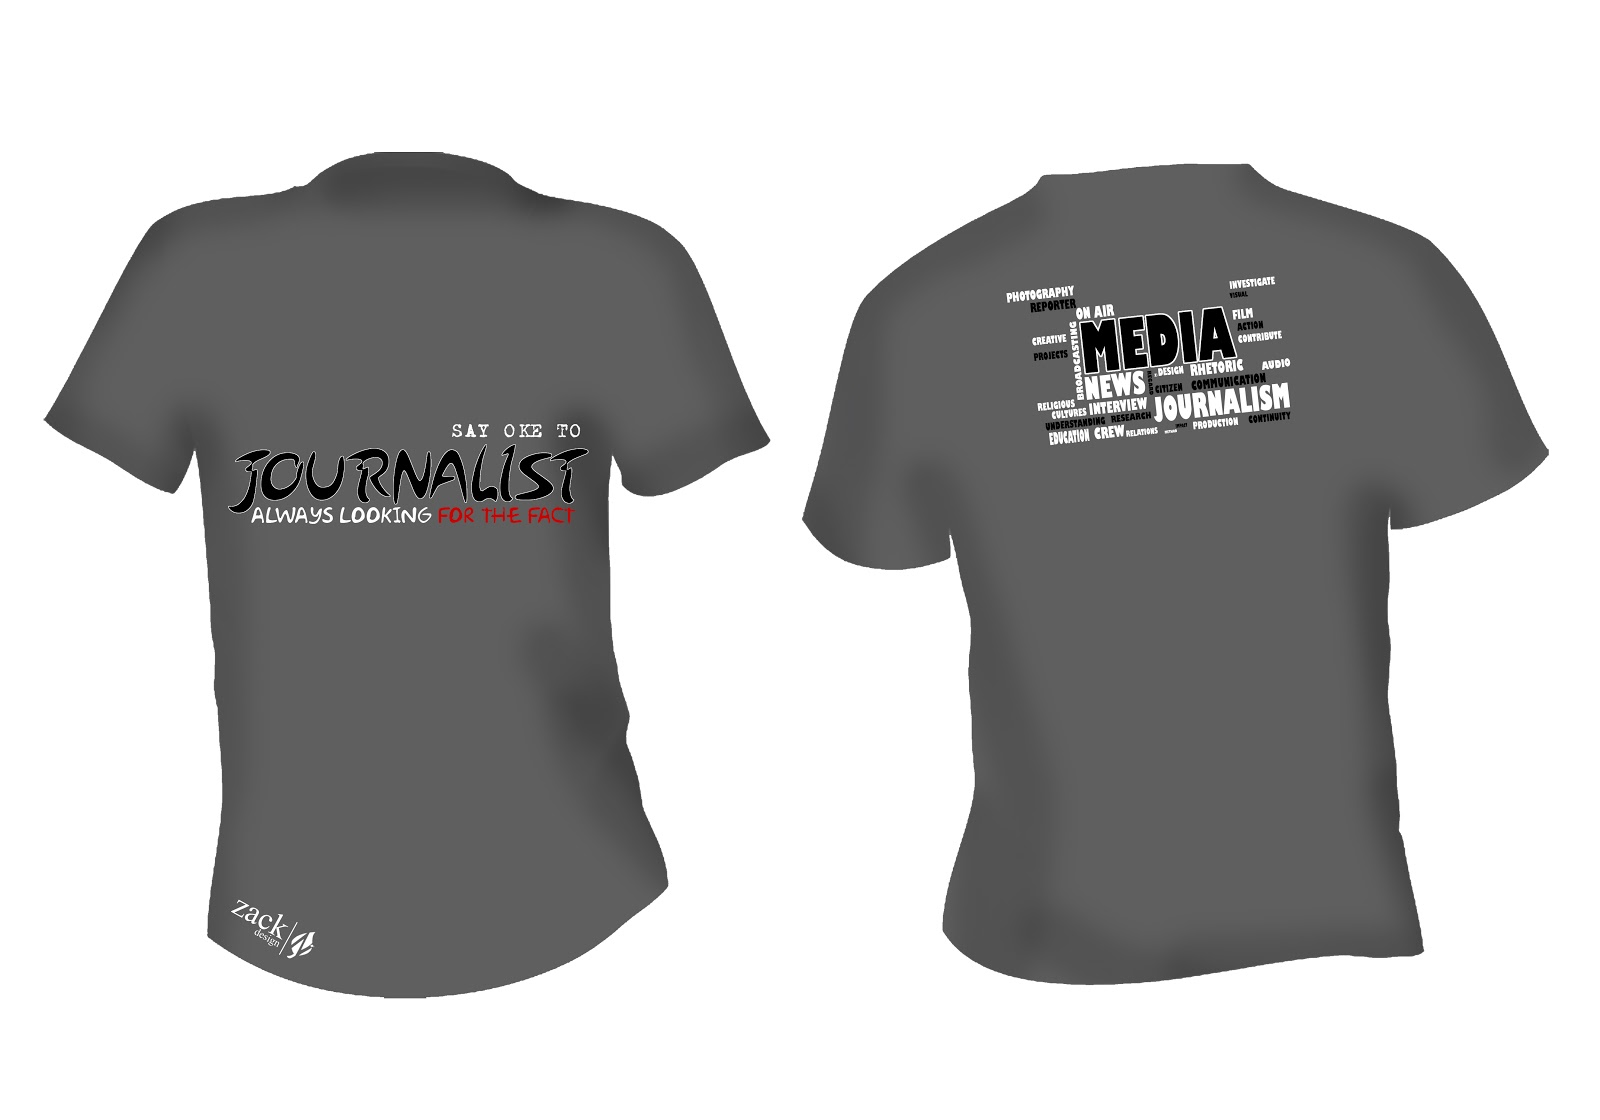 Desain t shirt jkt48 - Contoh Desain Baju Zhackjack